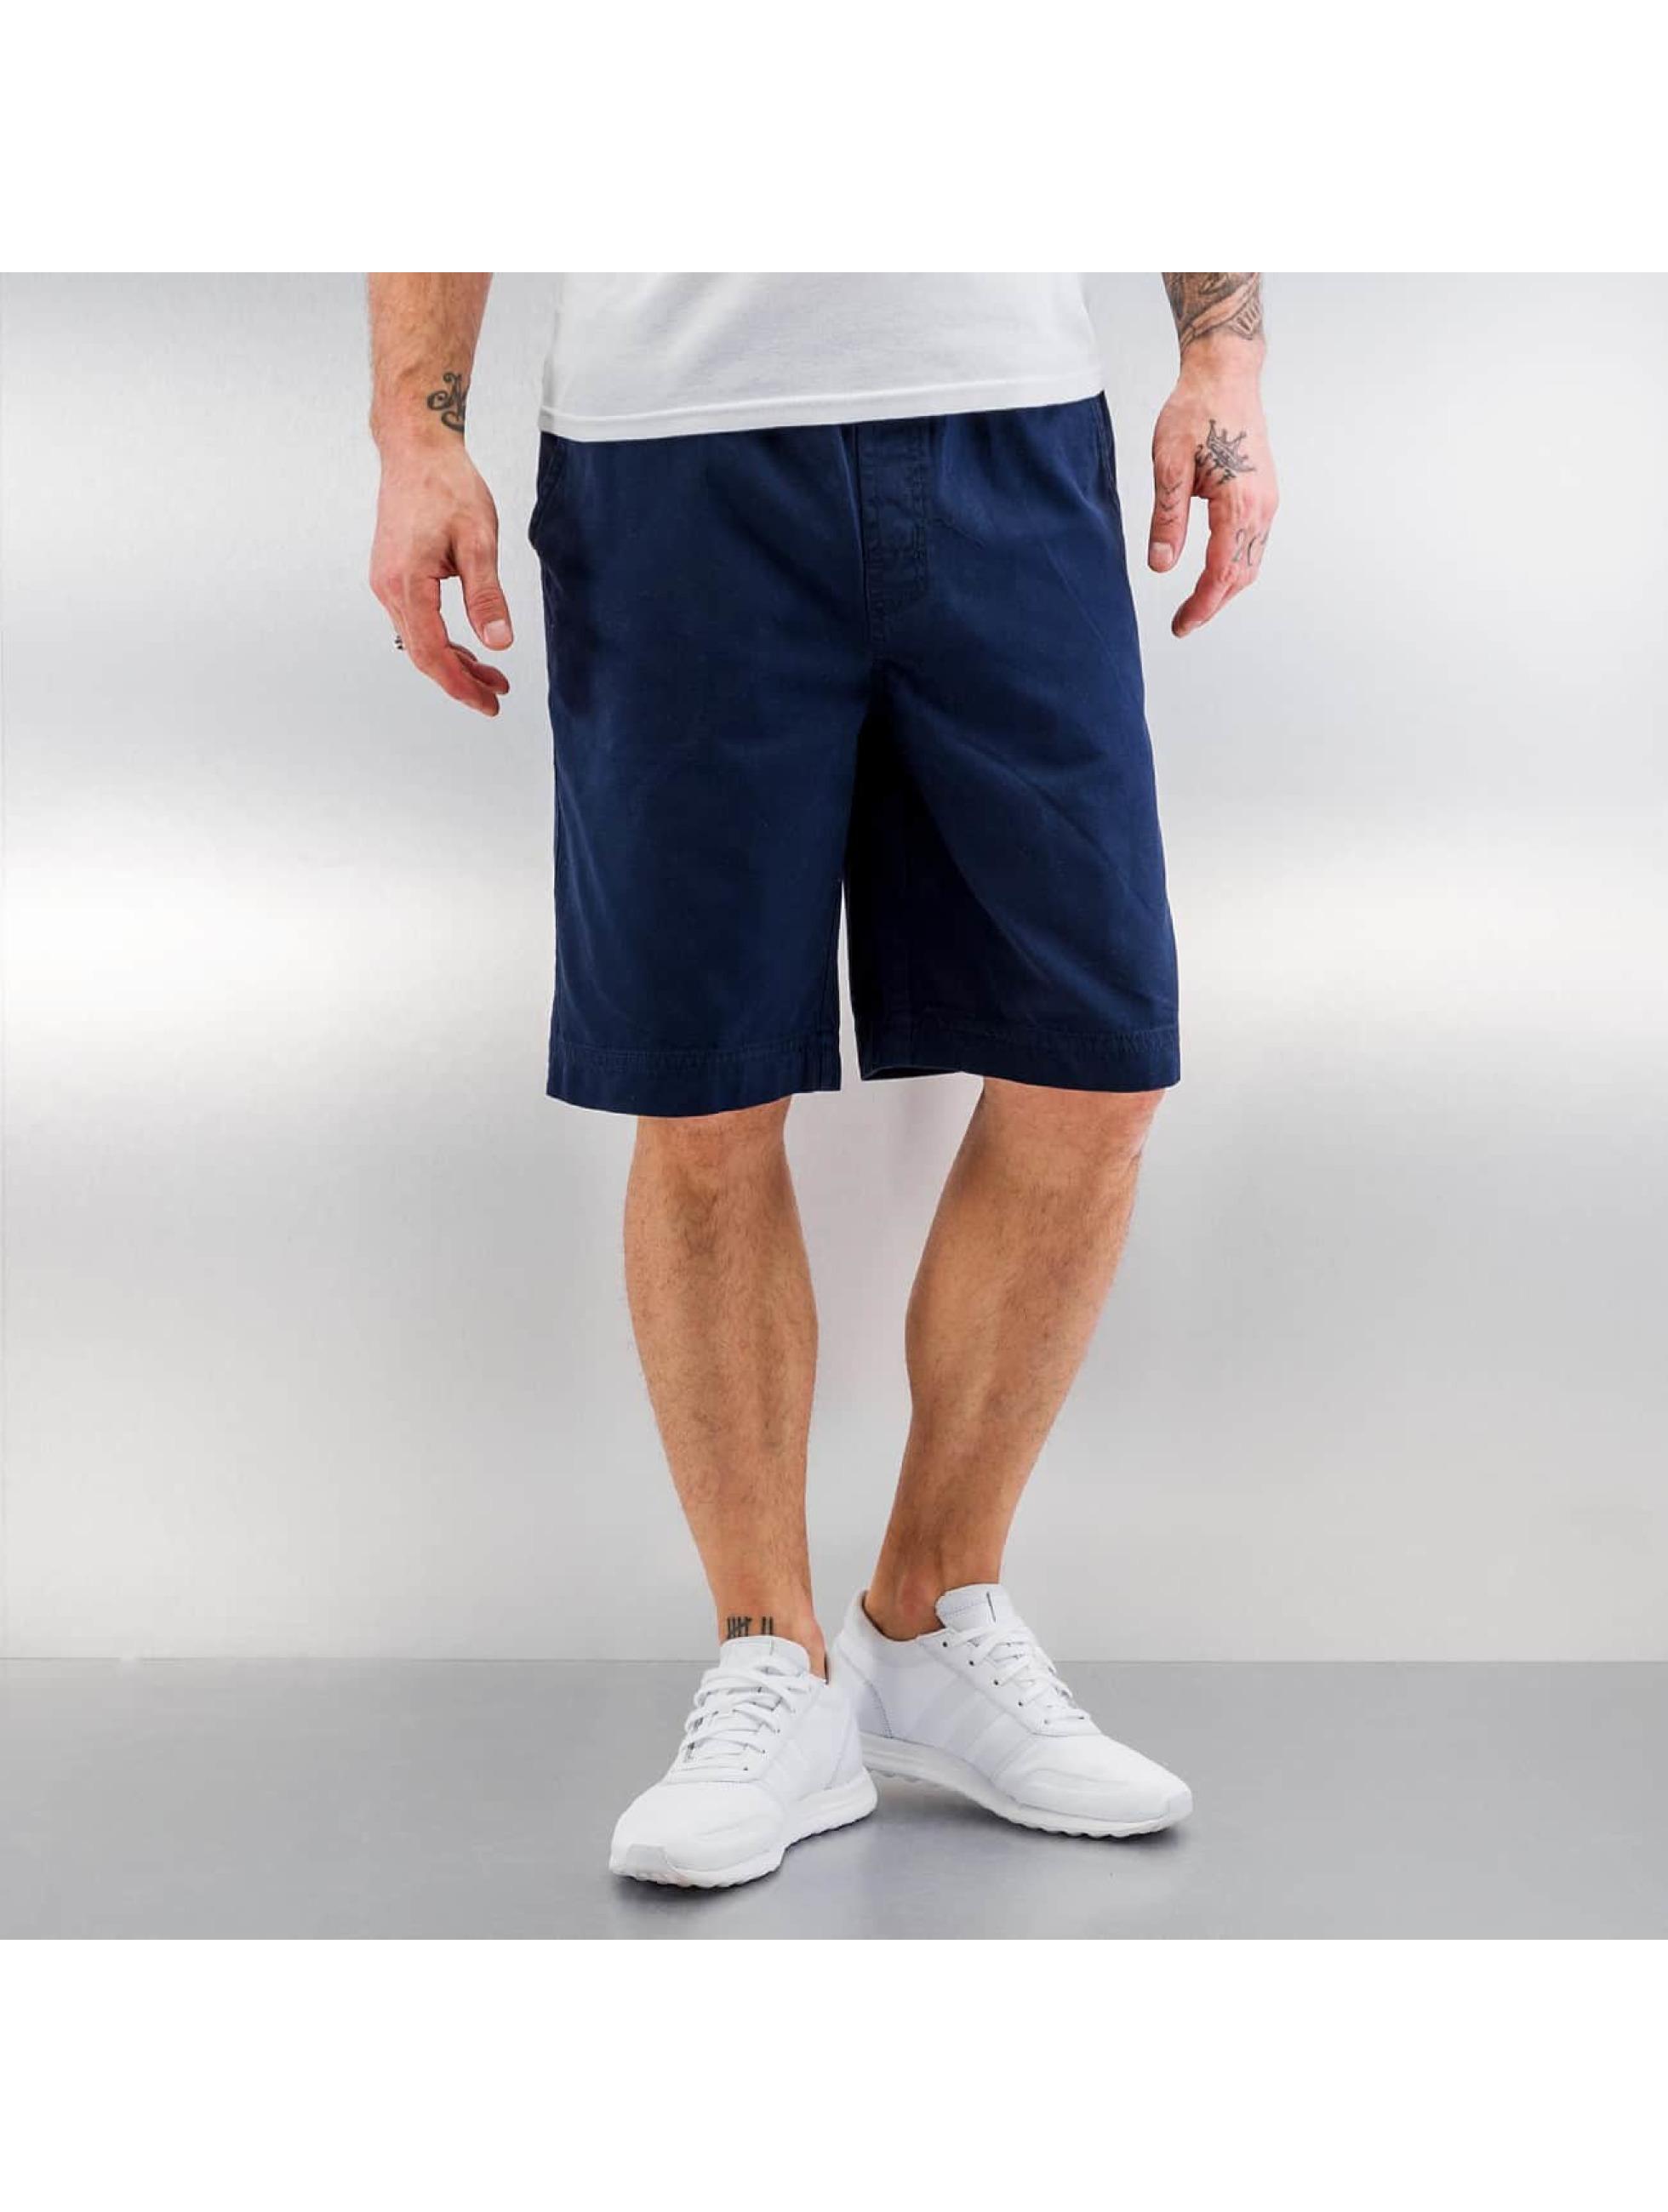 Amsterdenim Shorts Bert blu